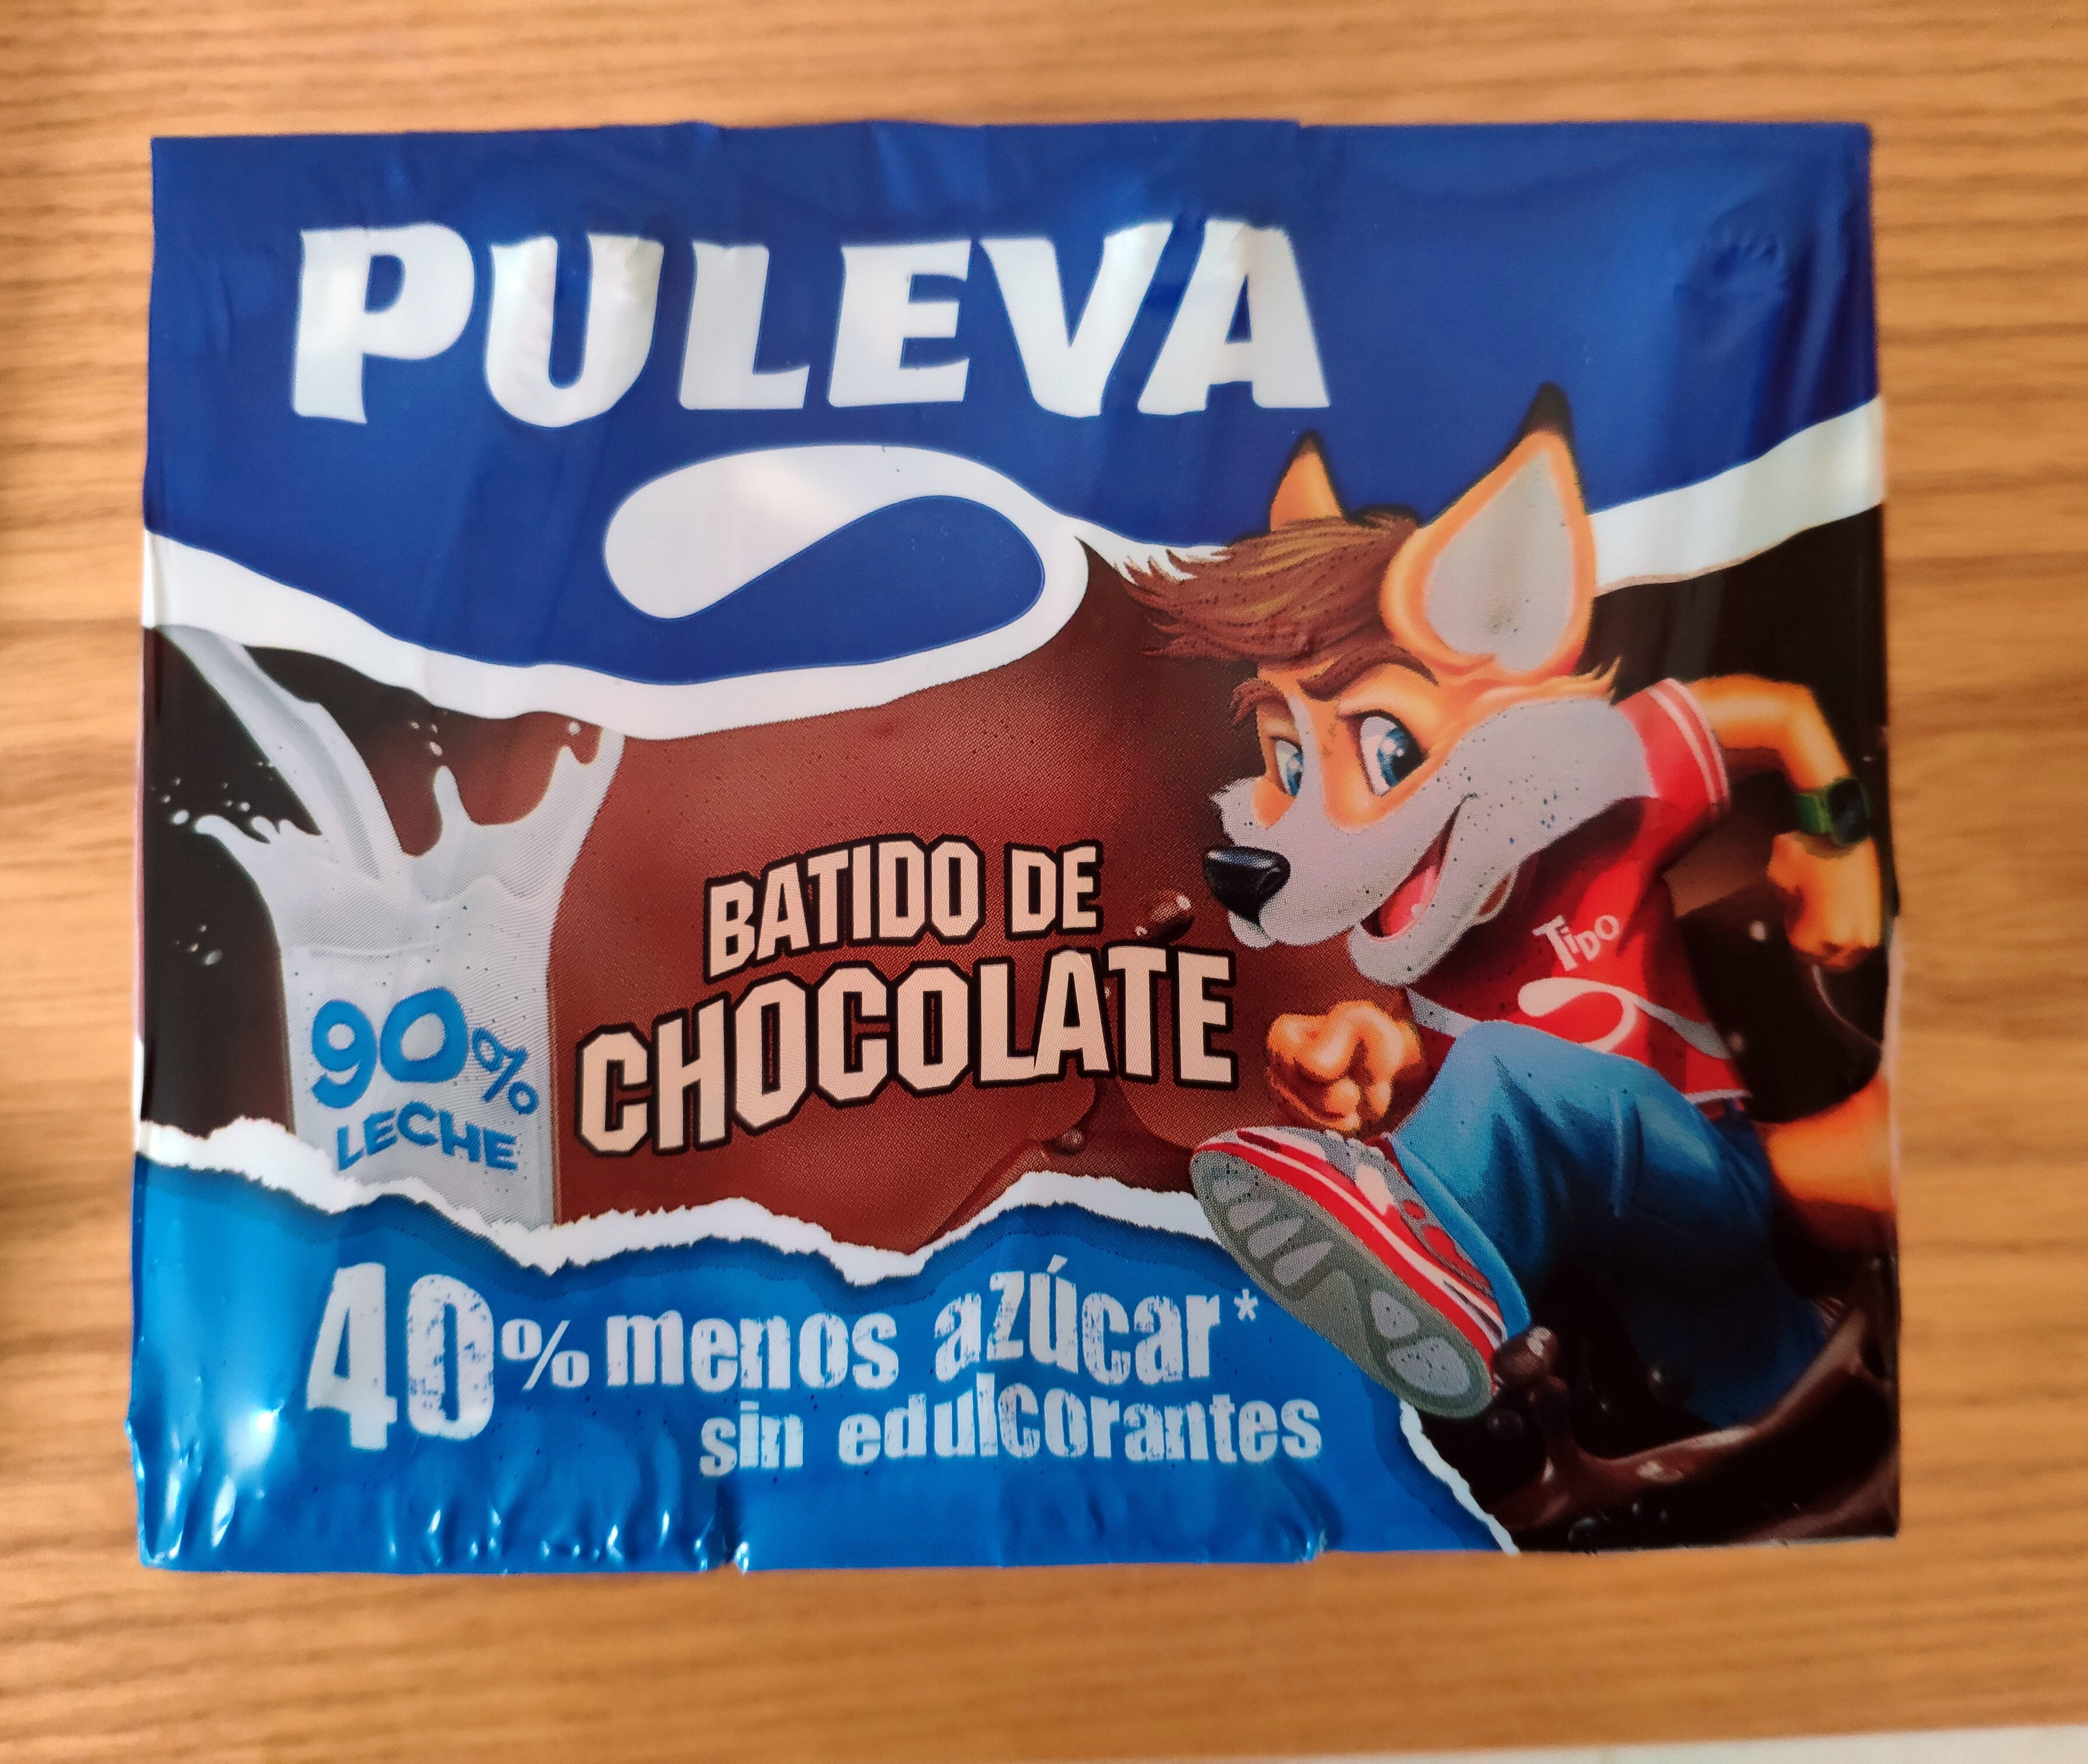 Batido de chocolate 90% leche - Producte - es